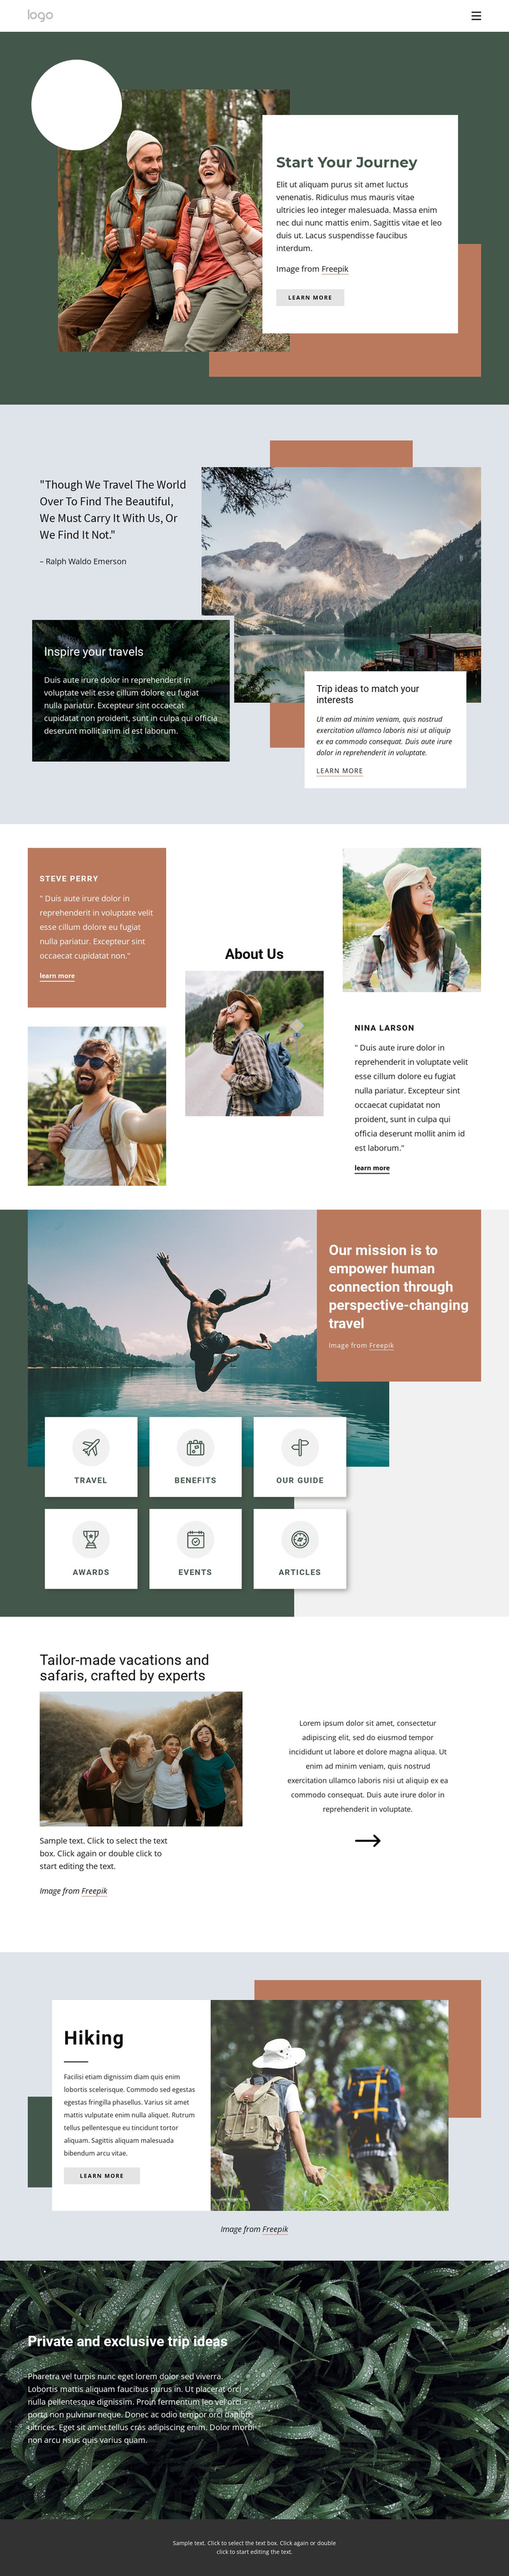 Adventure travel company Website Builder Software